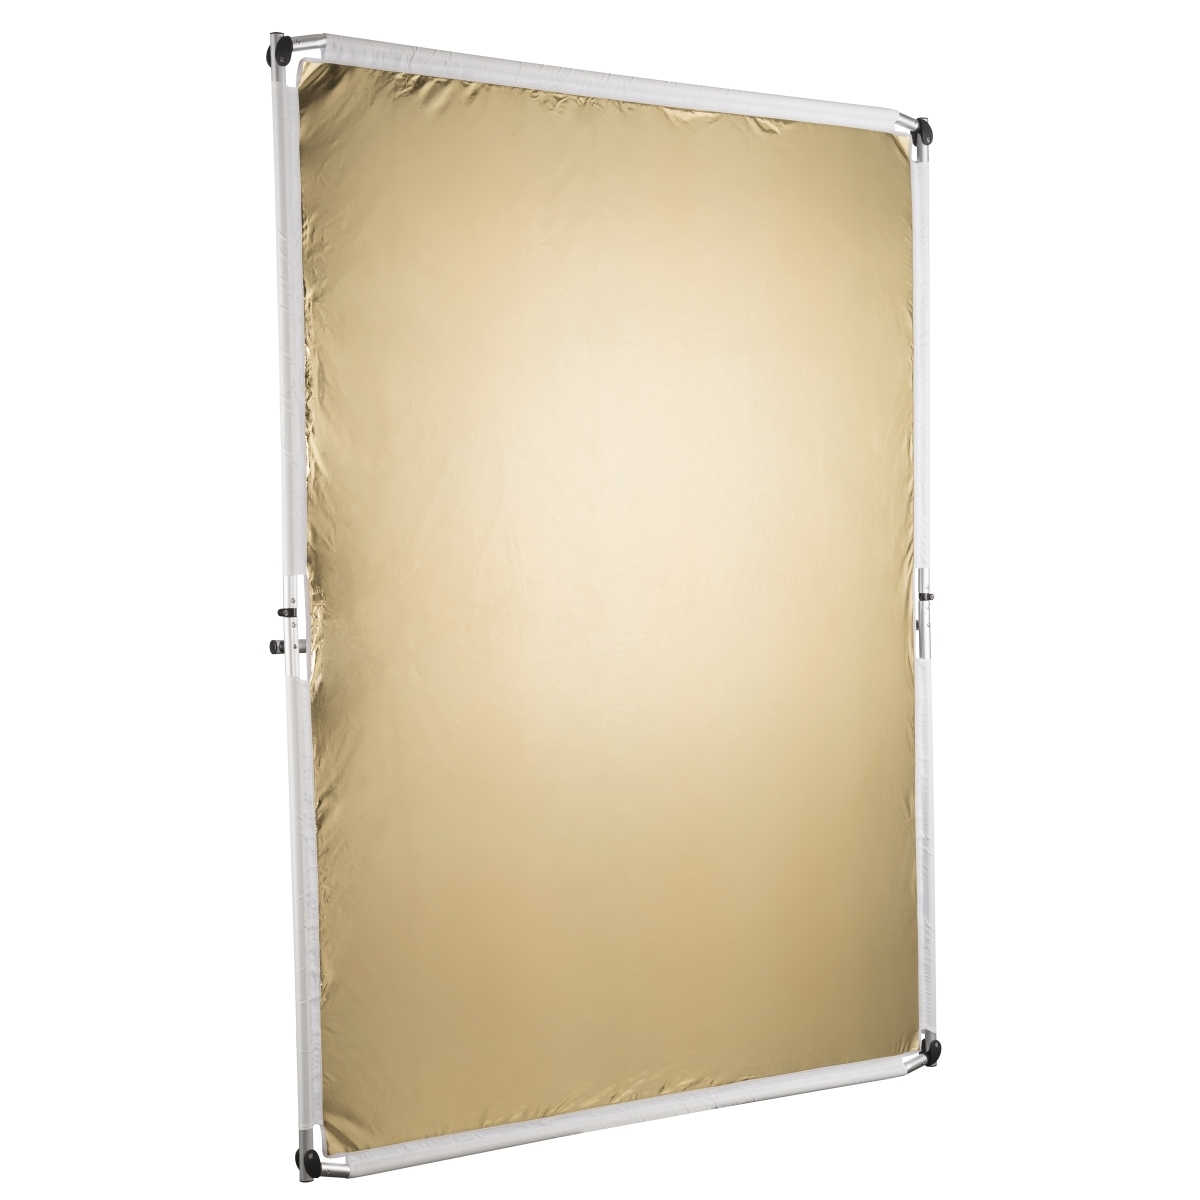 Walimex pro Jumbo 4in1 Reflector Panel, 150x200cm